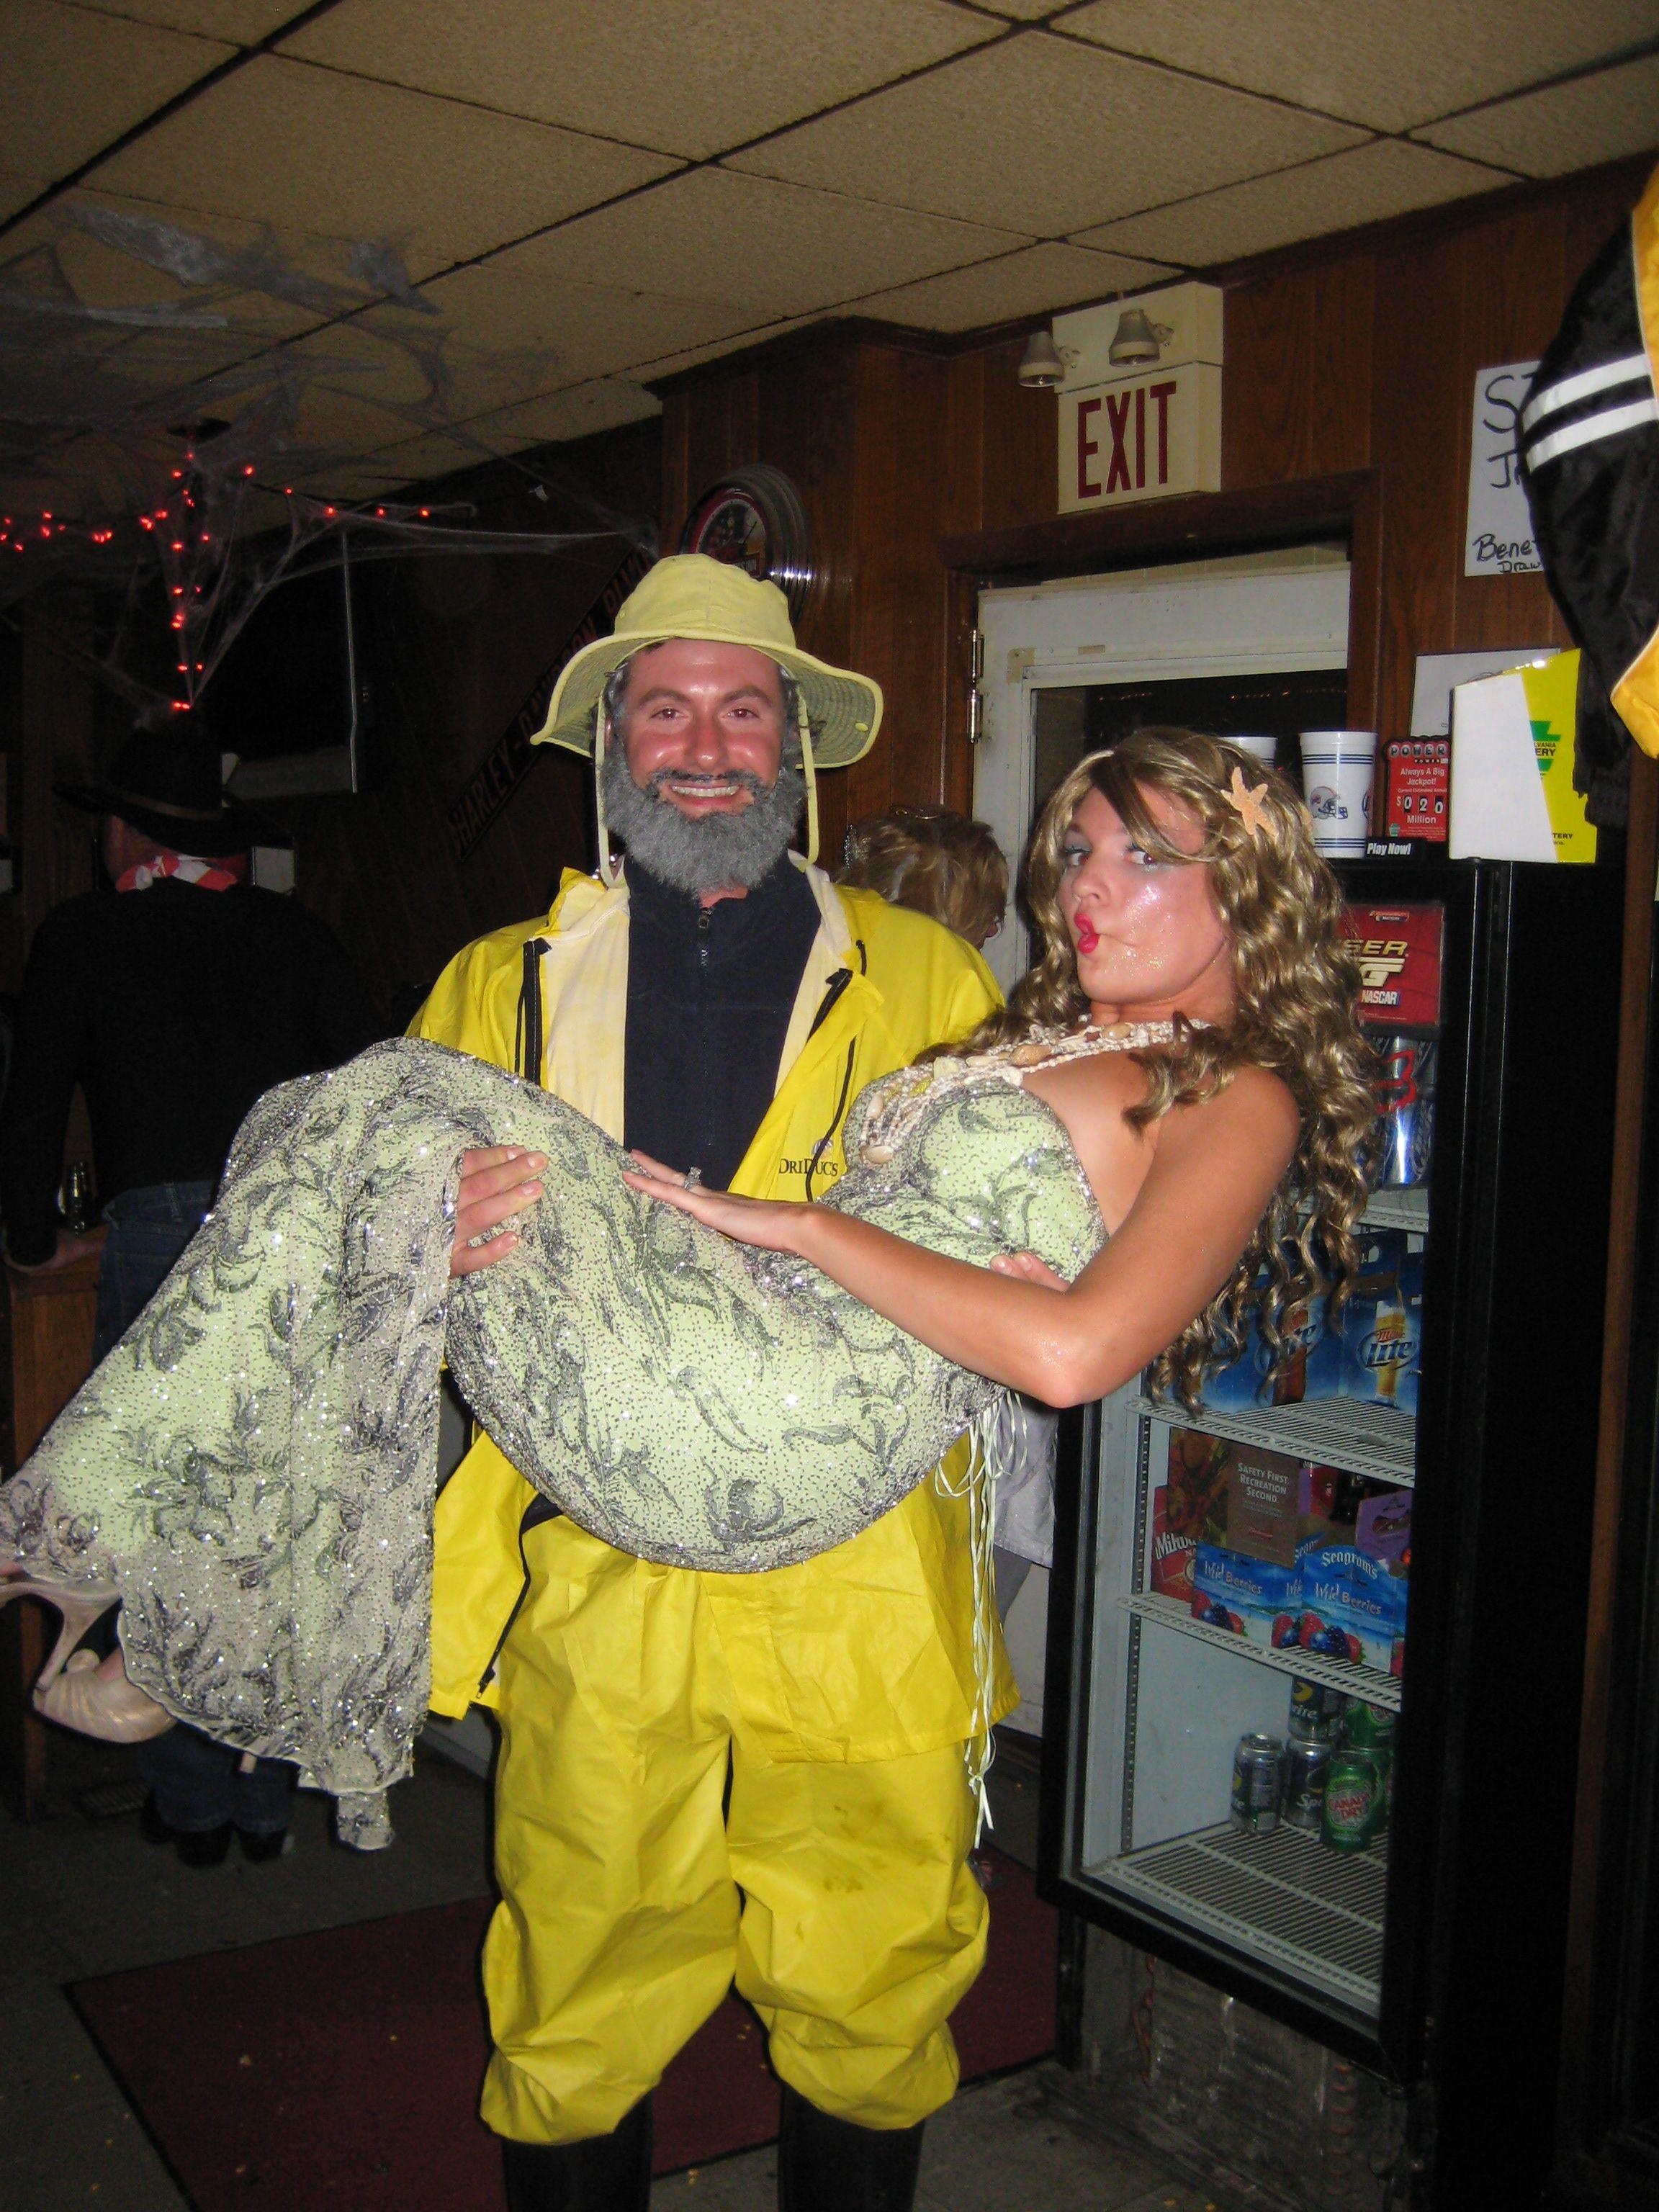 Couple's Halloween costume idea Gorton's fisherman and a